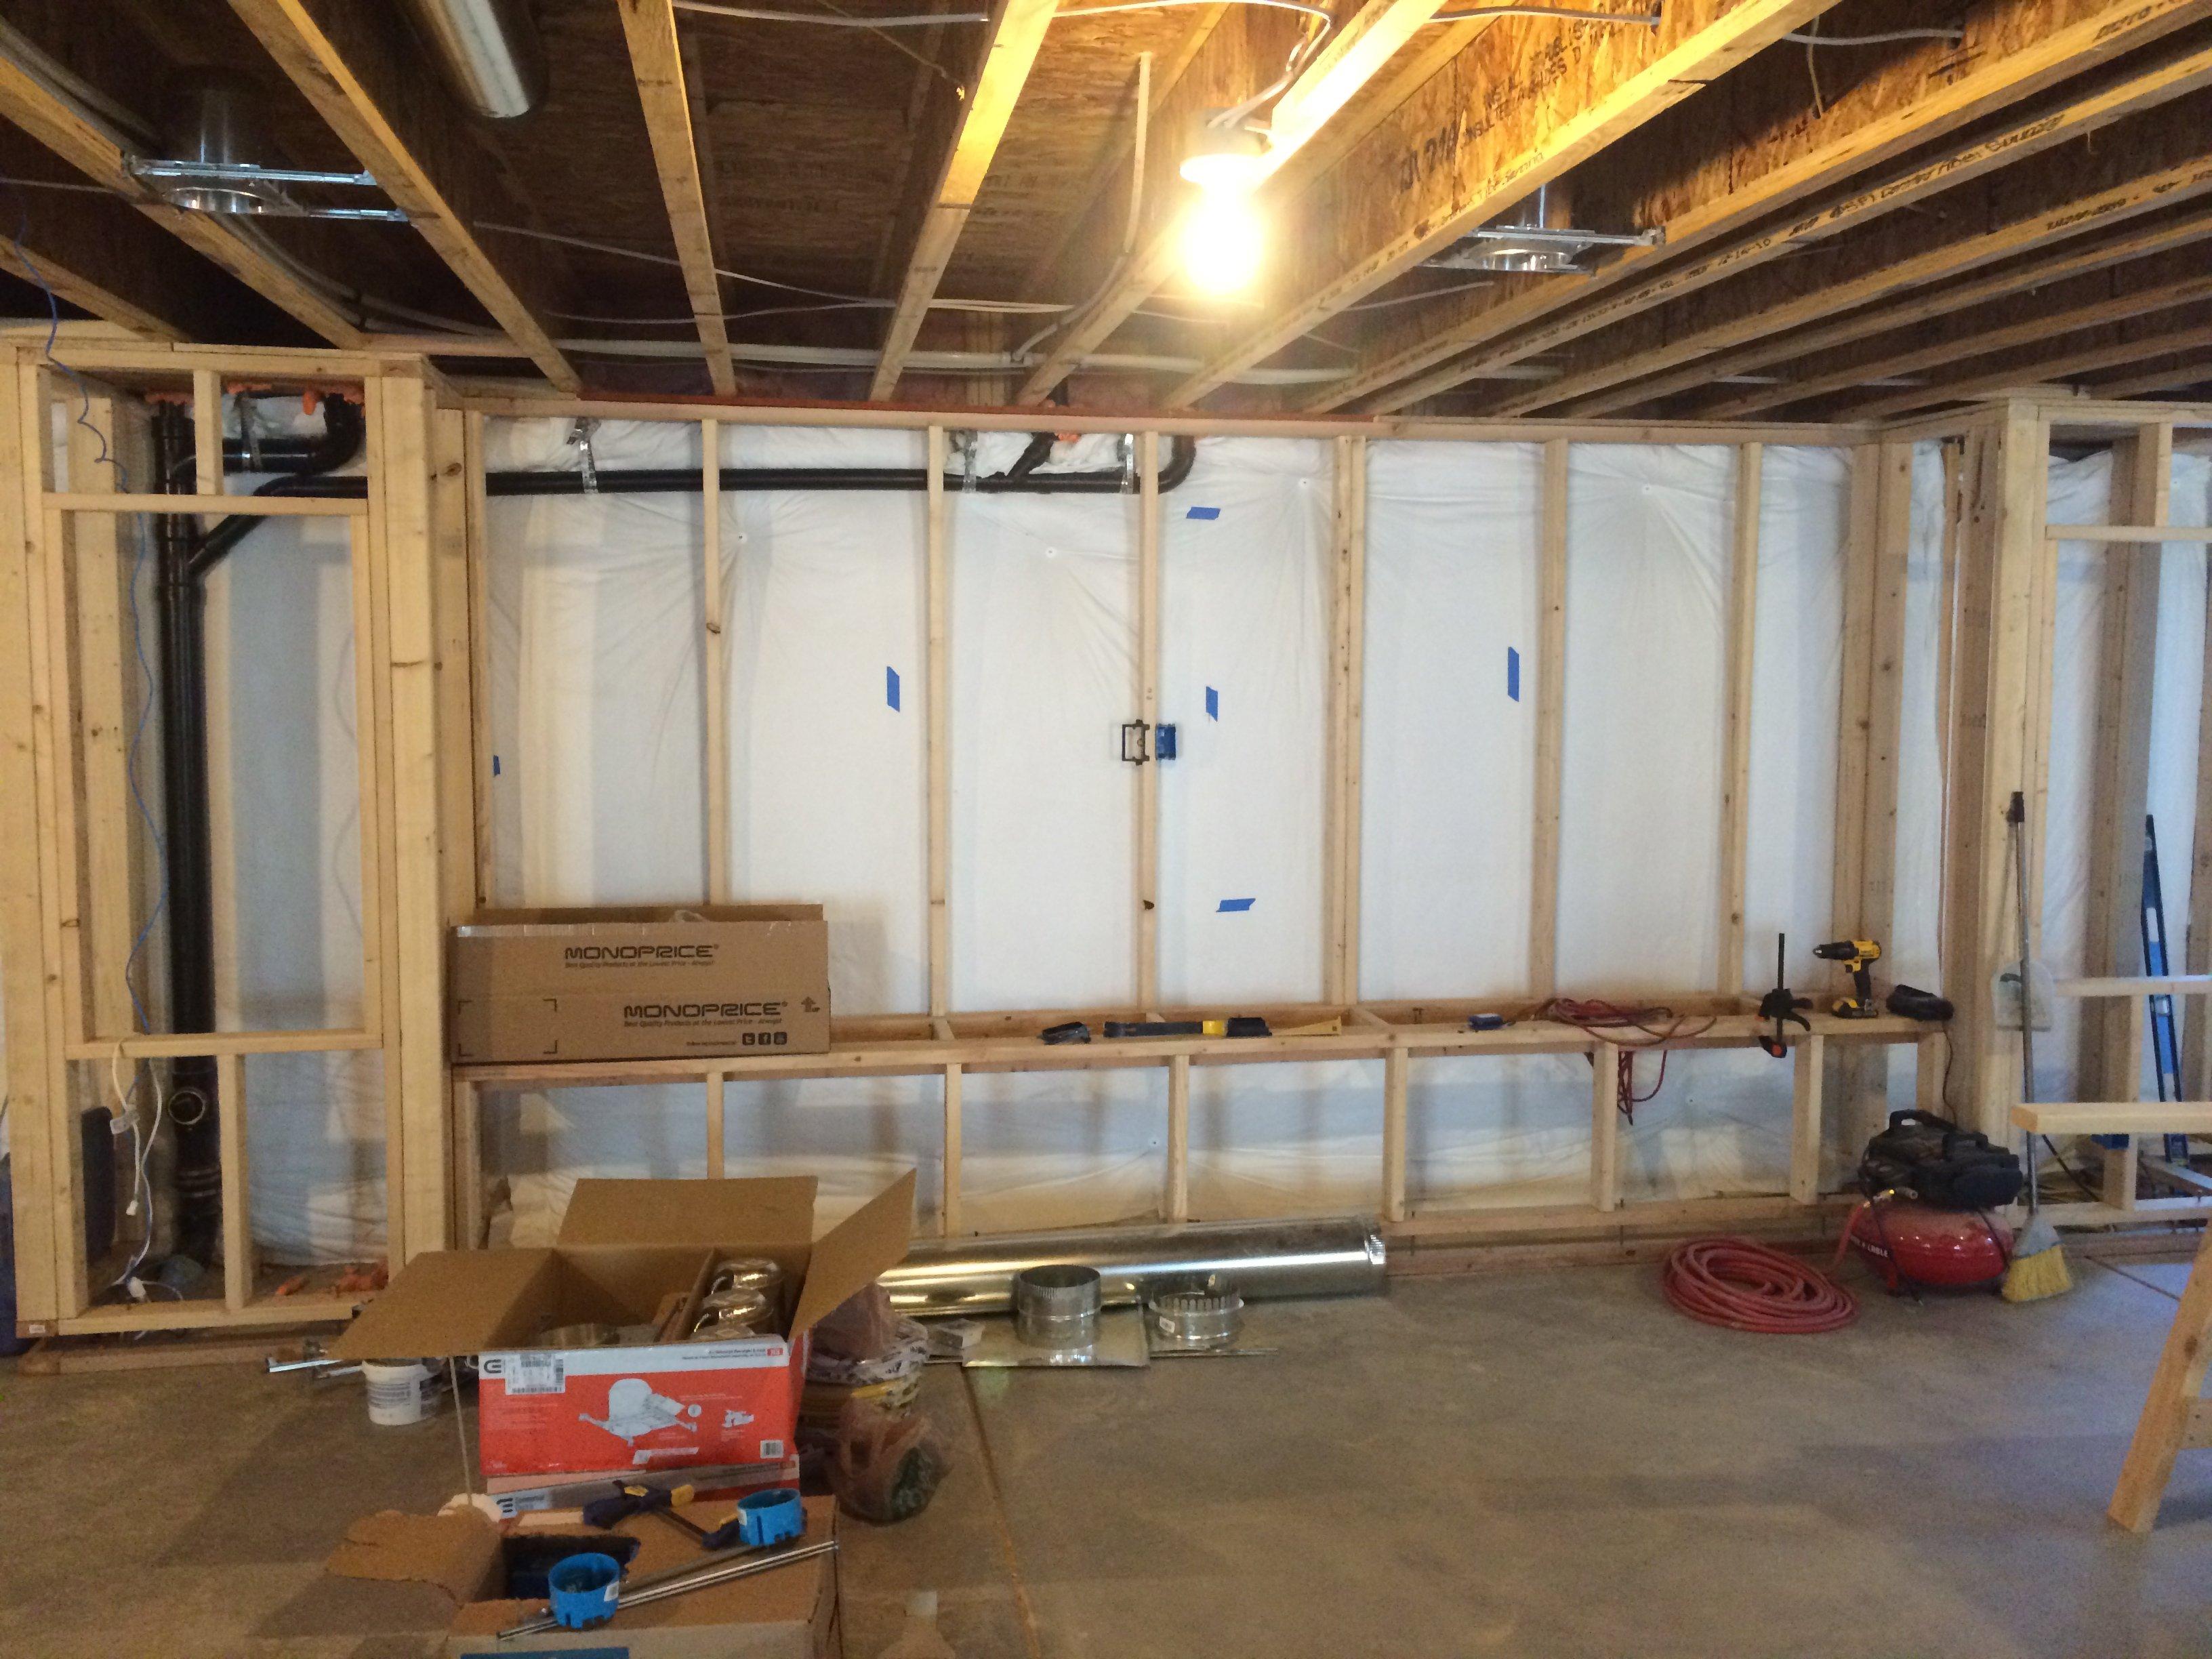 basement build wall mount and tv pre wire suggestions avs forum rh avsforum com Basement Wiring Plan Wiring a Dryer in the Basement